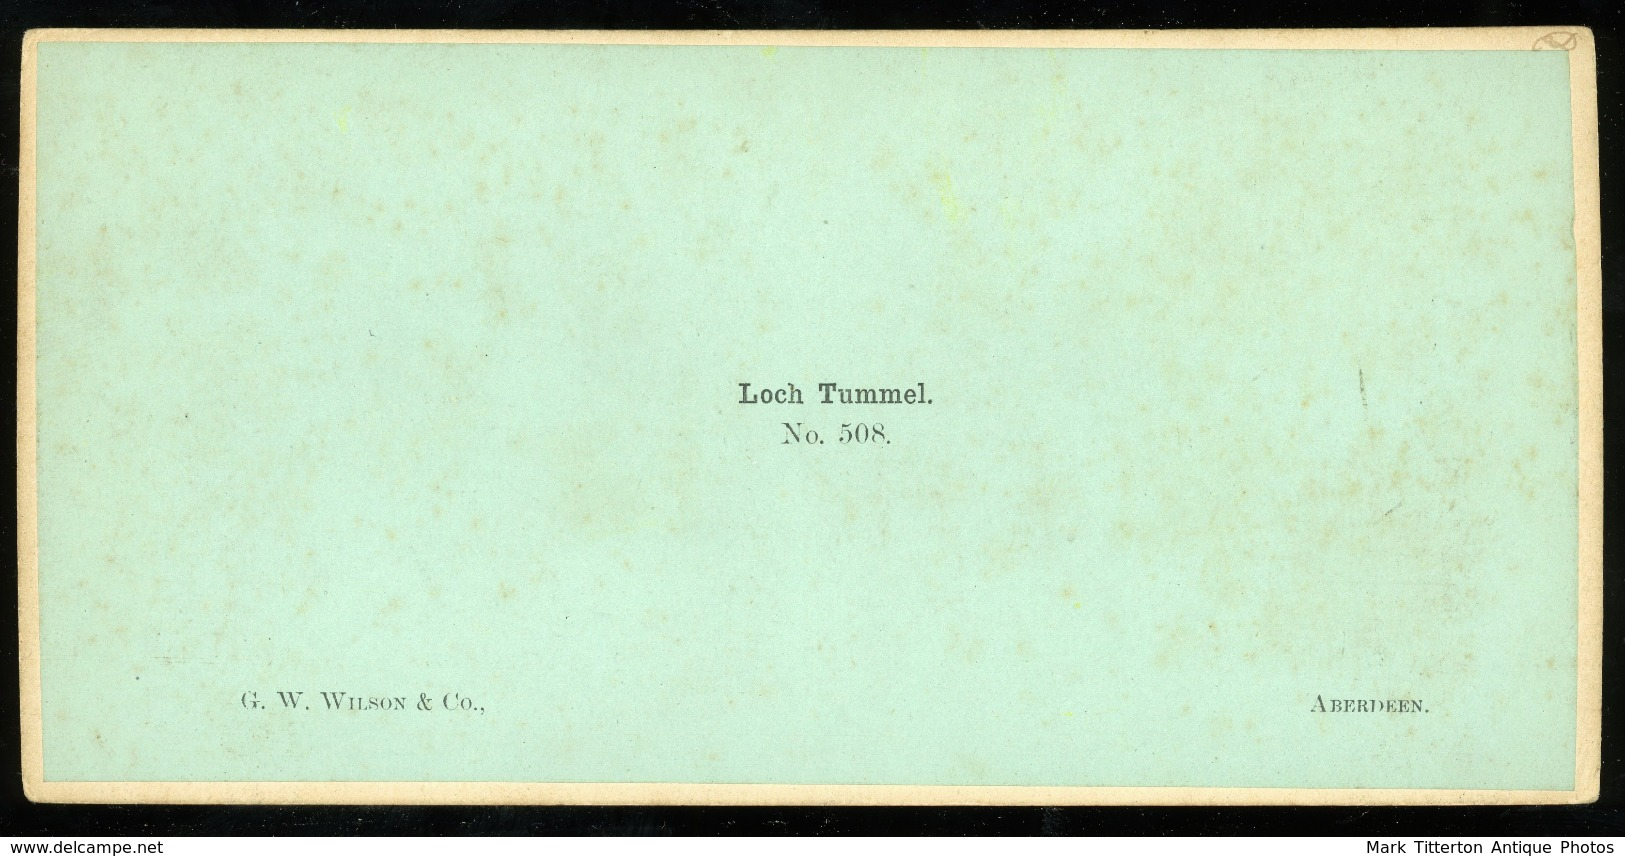 Stereoview - Loch Tummel - SCOTLAND - By G. W. Wilson - Stereoscopi